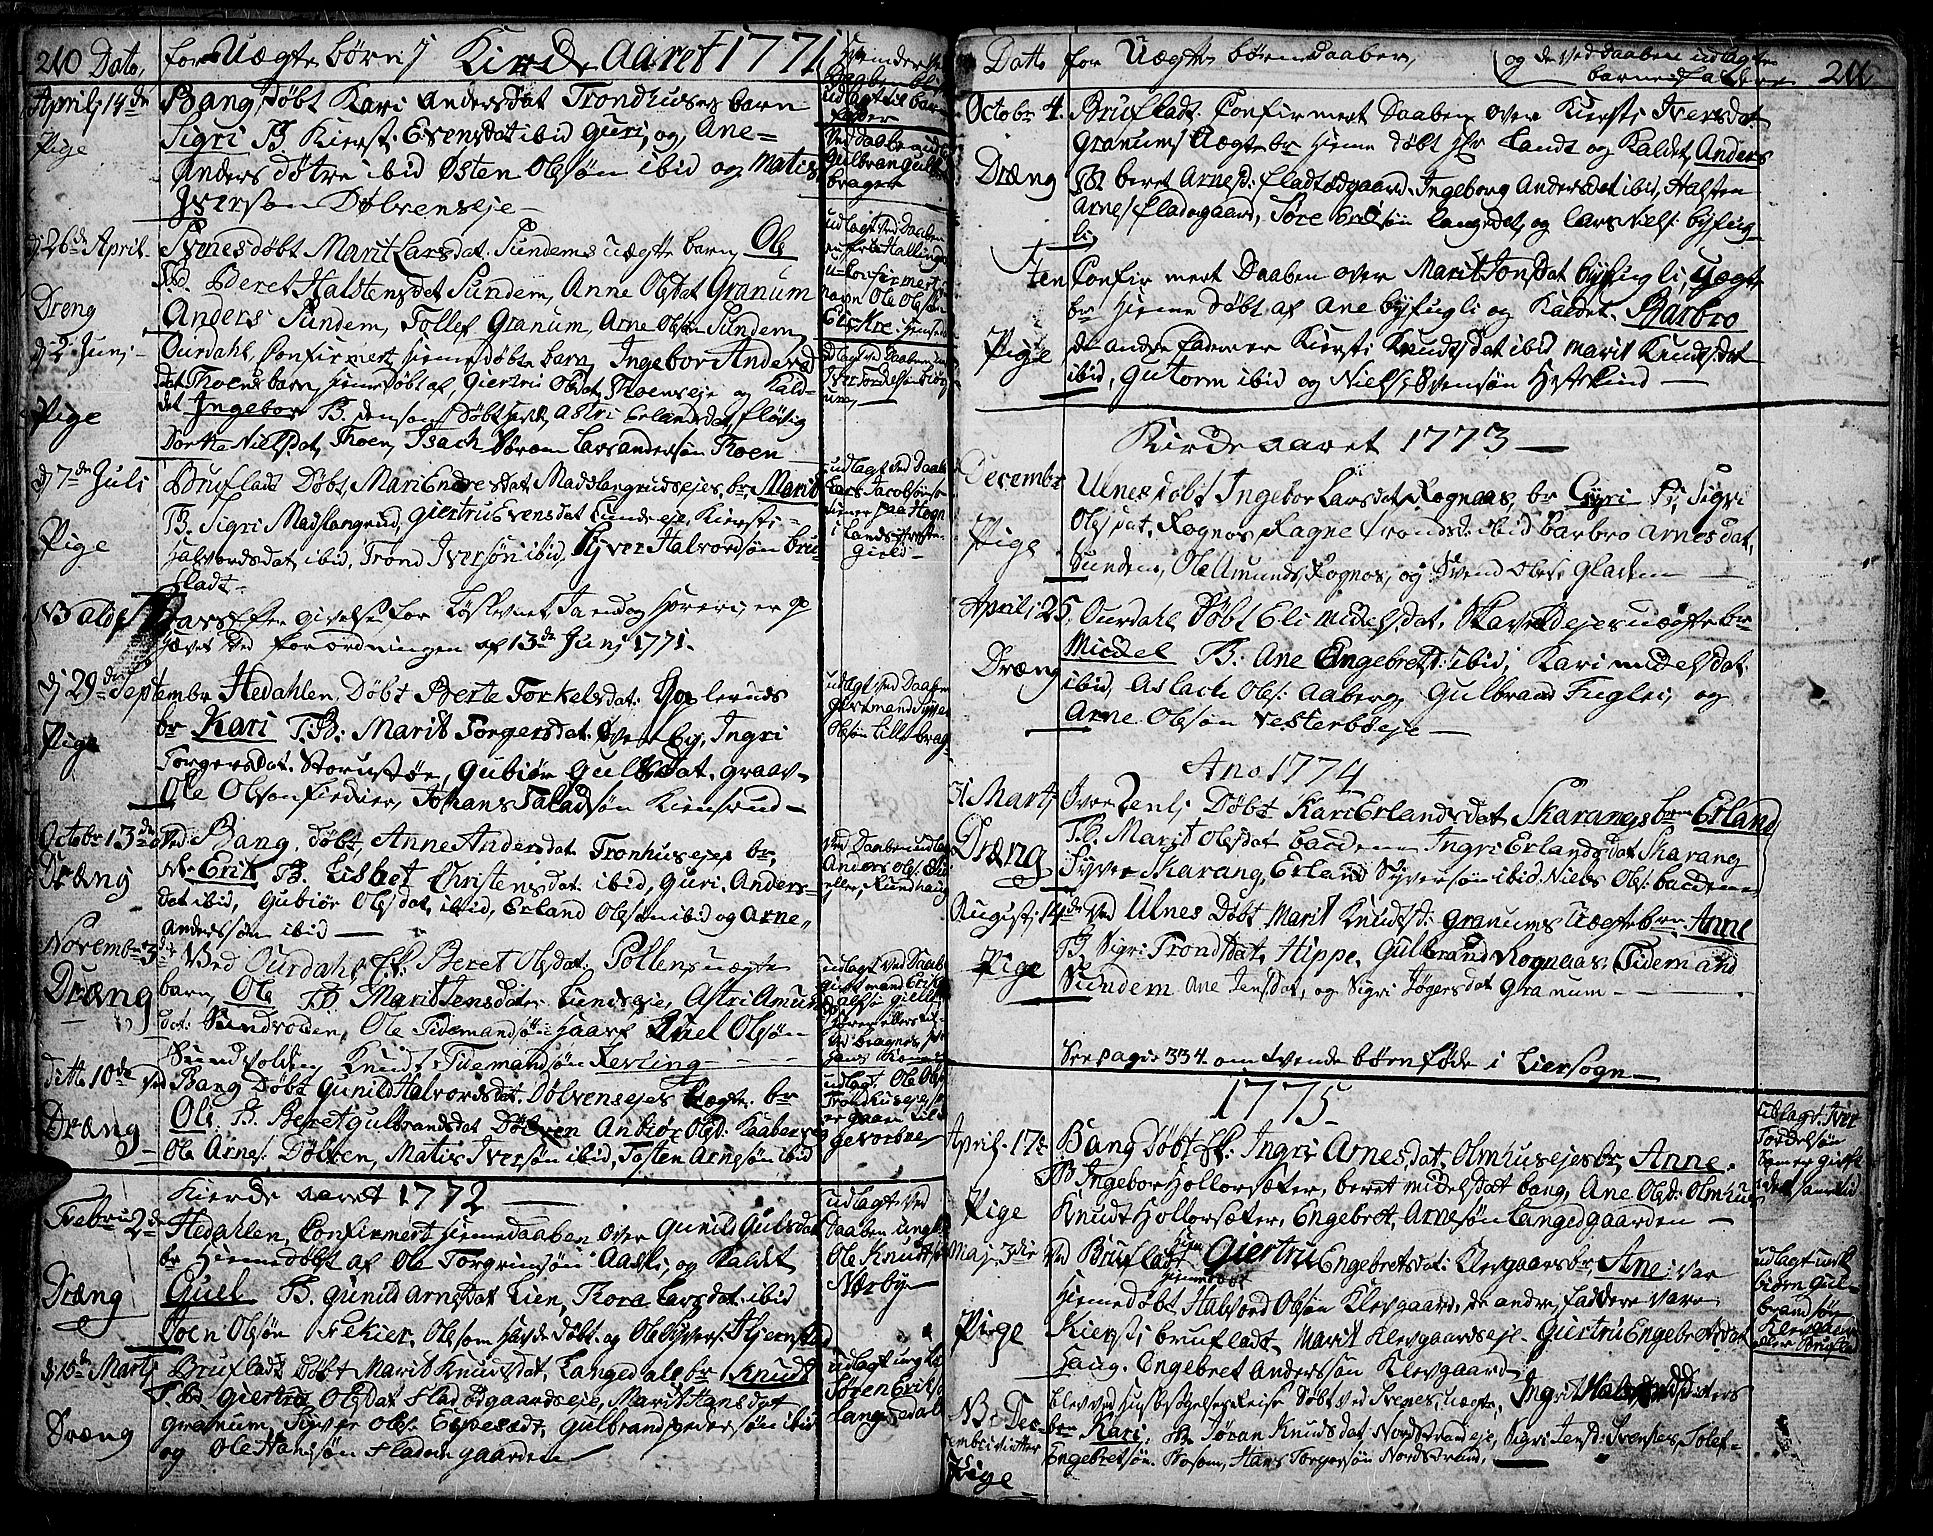 SAH, Aurdal prestekontor, Ministerialbok nr. 5, 1763-1781, s. 210-211